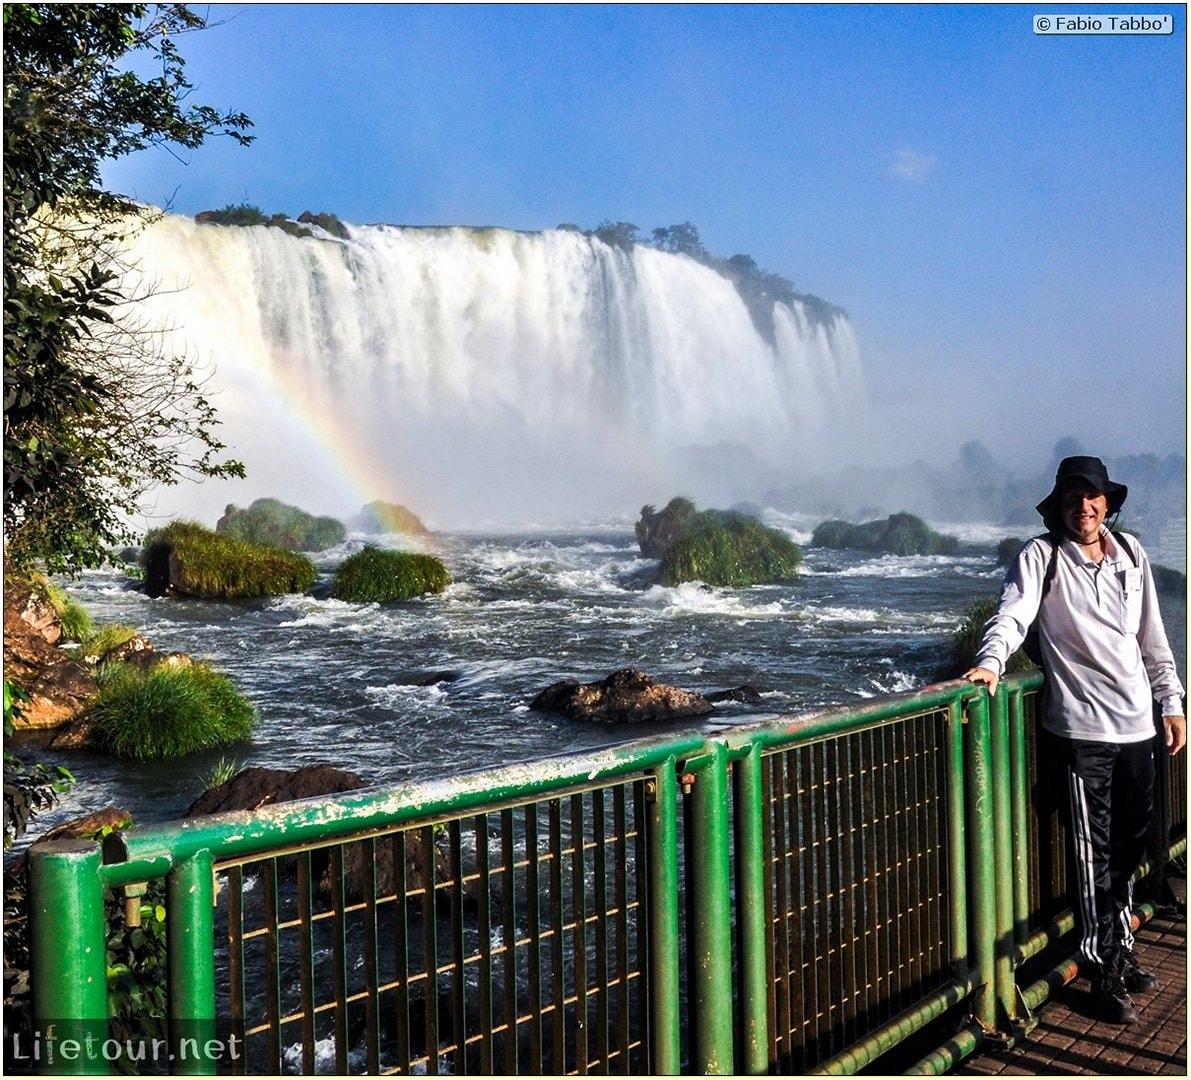 Fabio's LifeTour - Brazil (2015 April-June and October) - Iguazu falls - The falls - 8143 cover